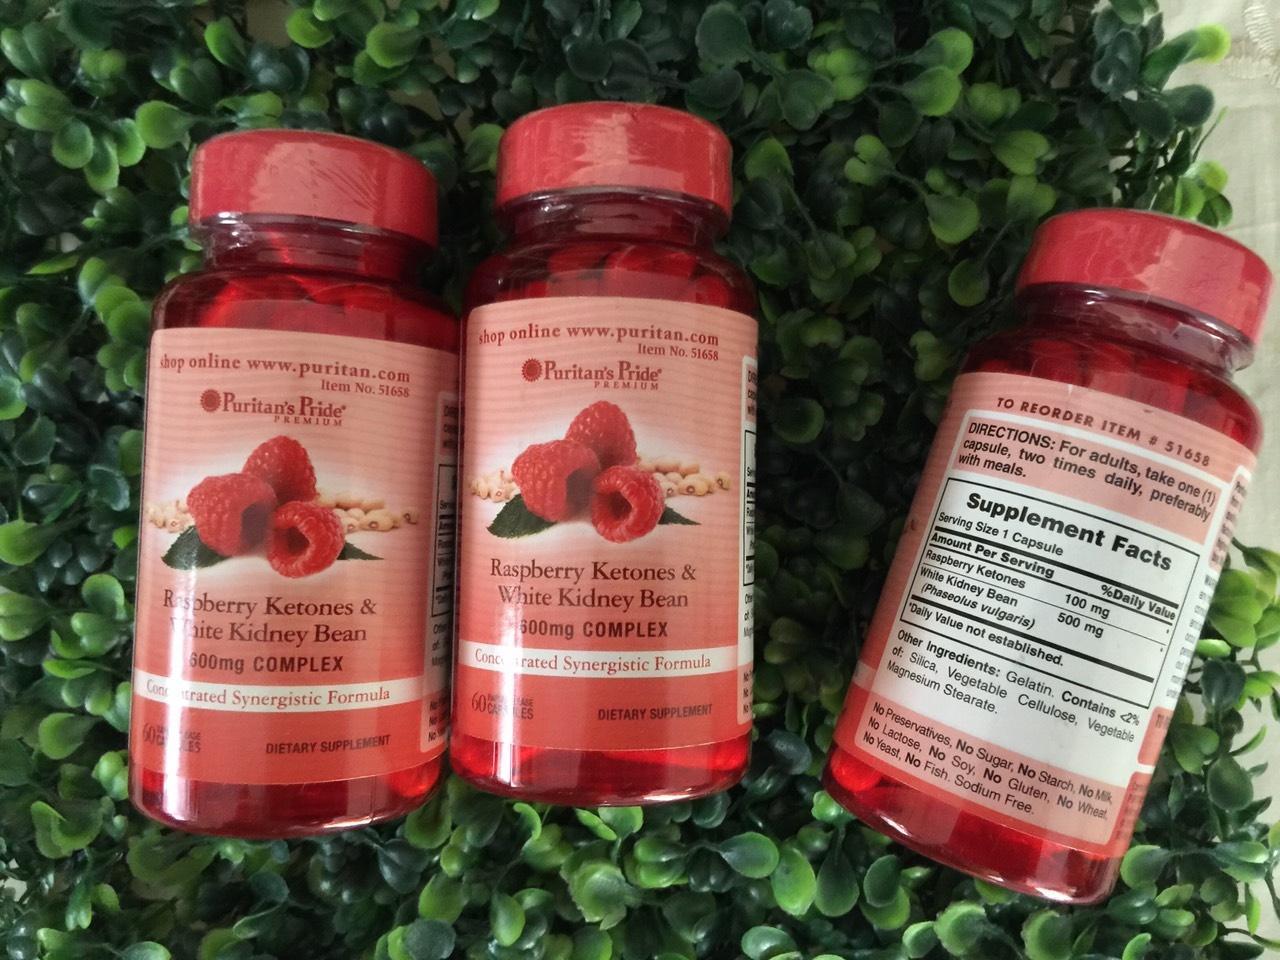 Viên uống hỗ trợ giảm cân Puritan's Pride Raspberry Ketones & White Kidney Bean 600mg Complex 60 viên HSD: 11/2019